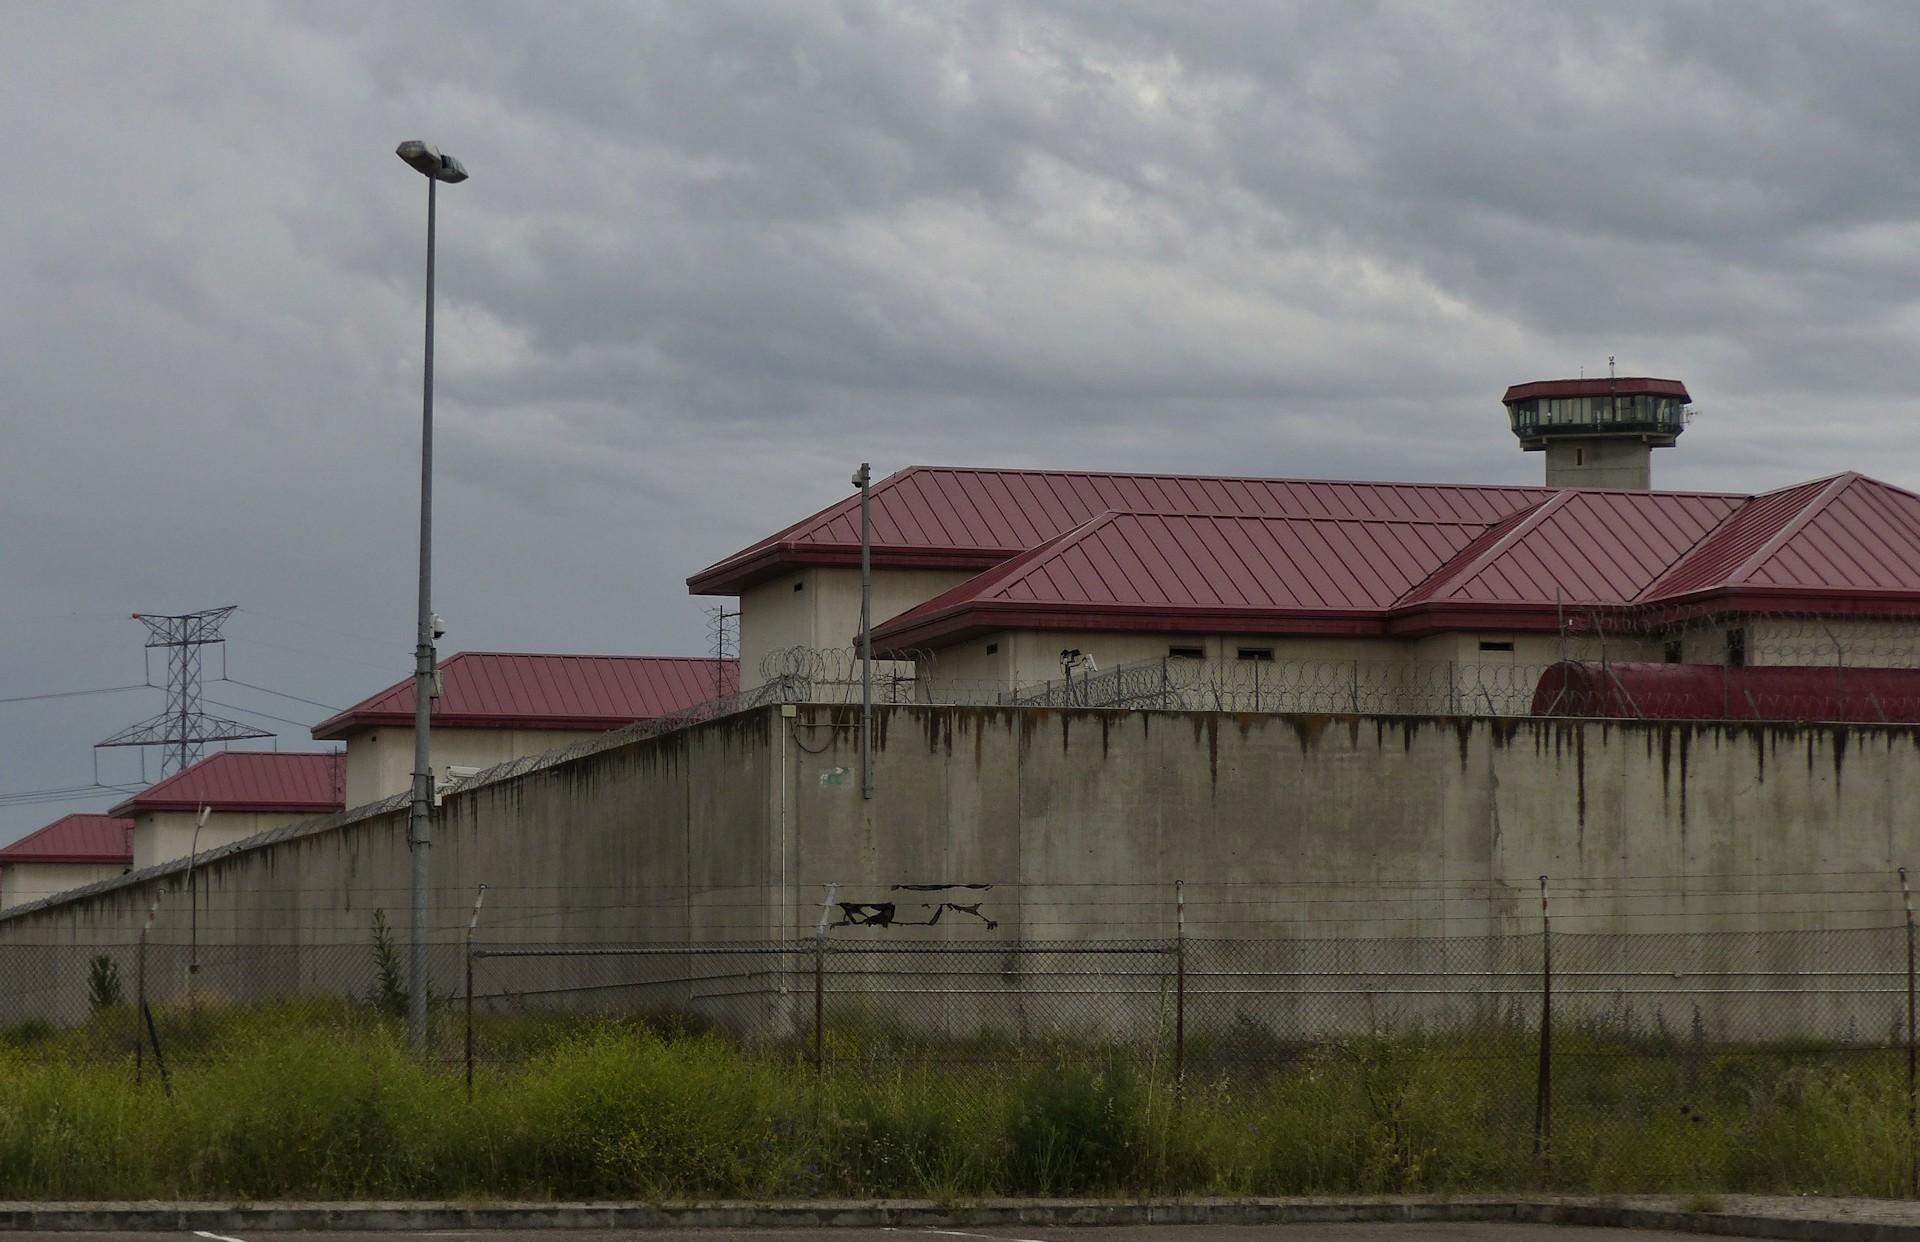 reportaje-prisiones-exterior-carcel-valdemoro-030620.jpg